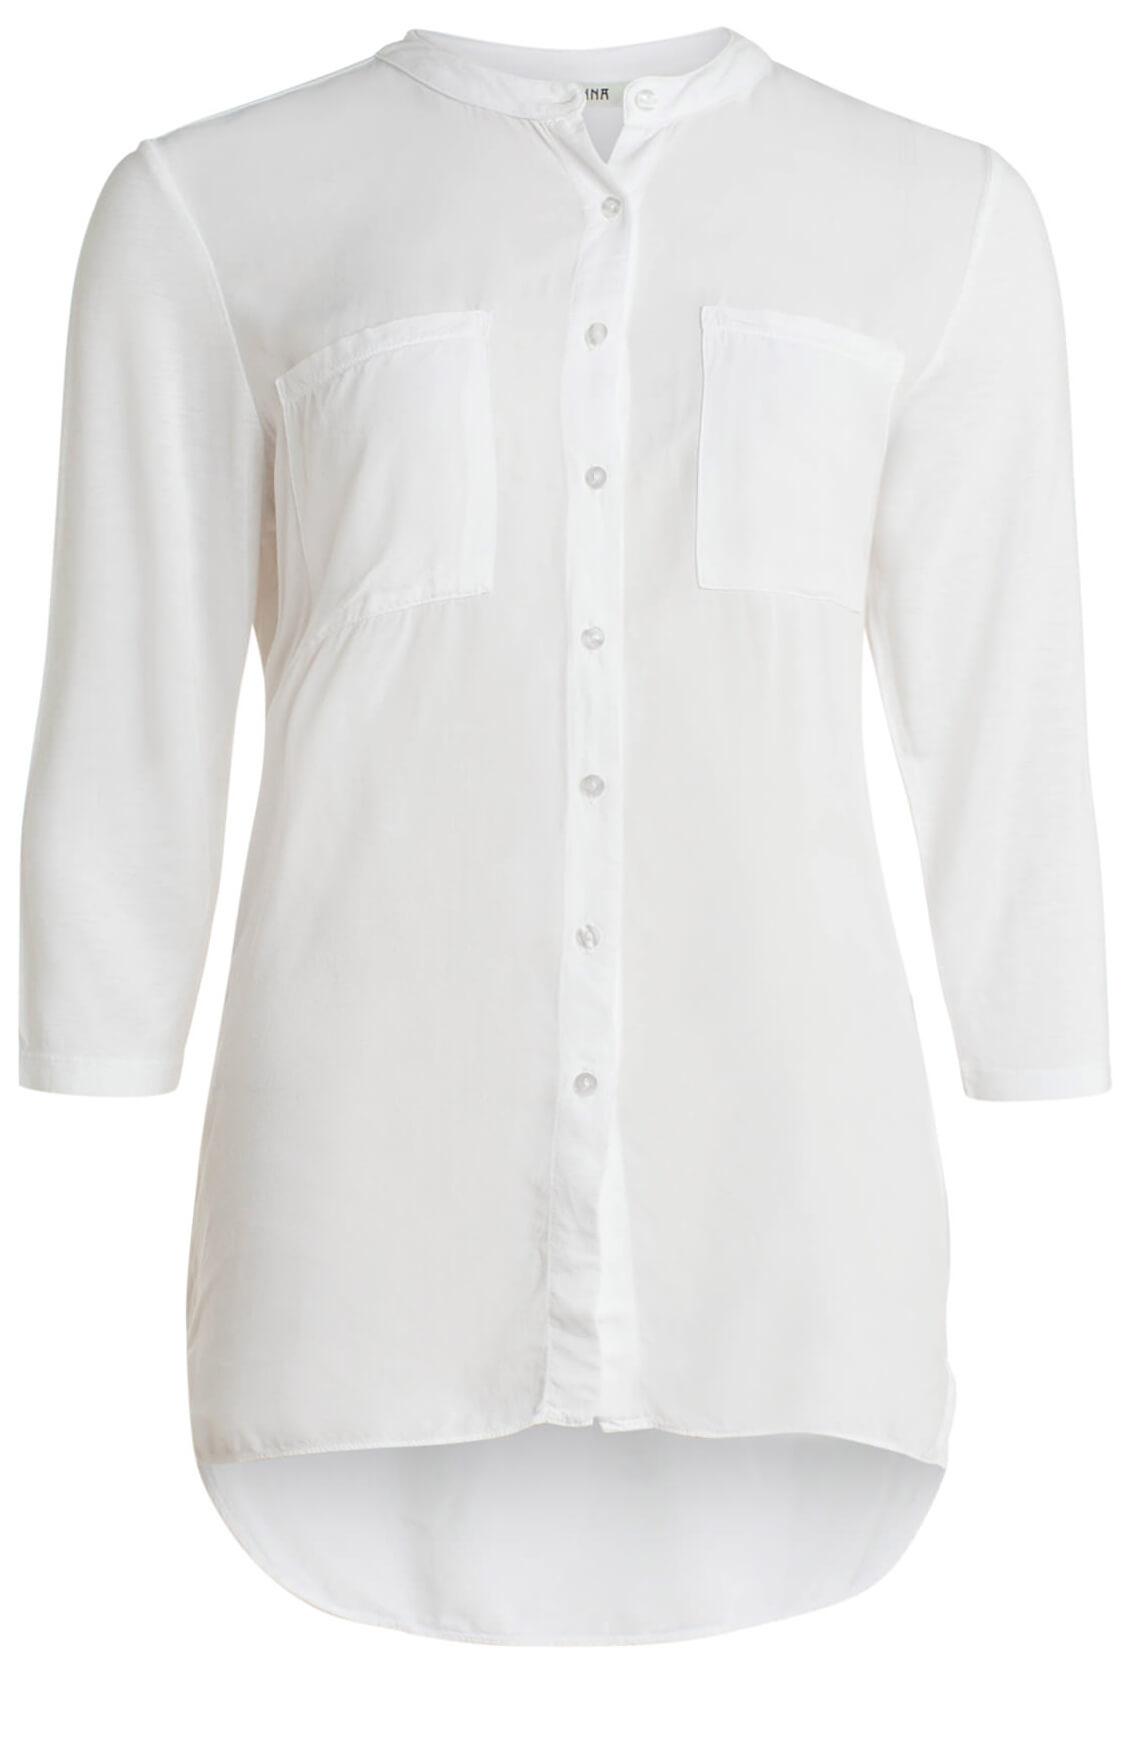 Anna Dames Materiaalmix blouse wit